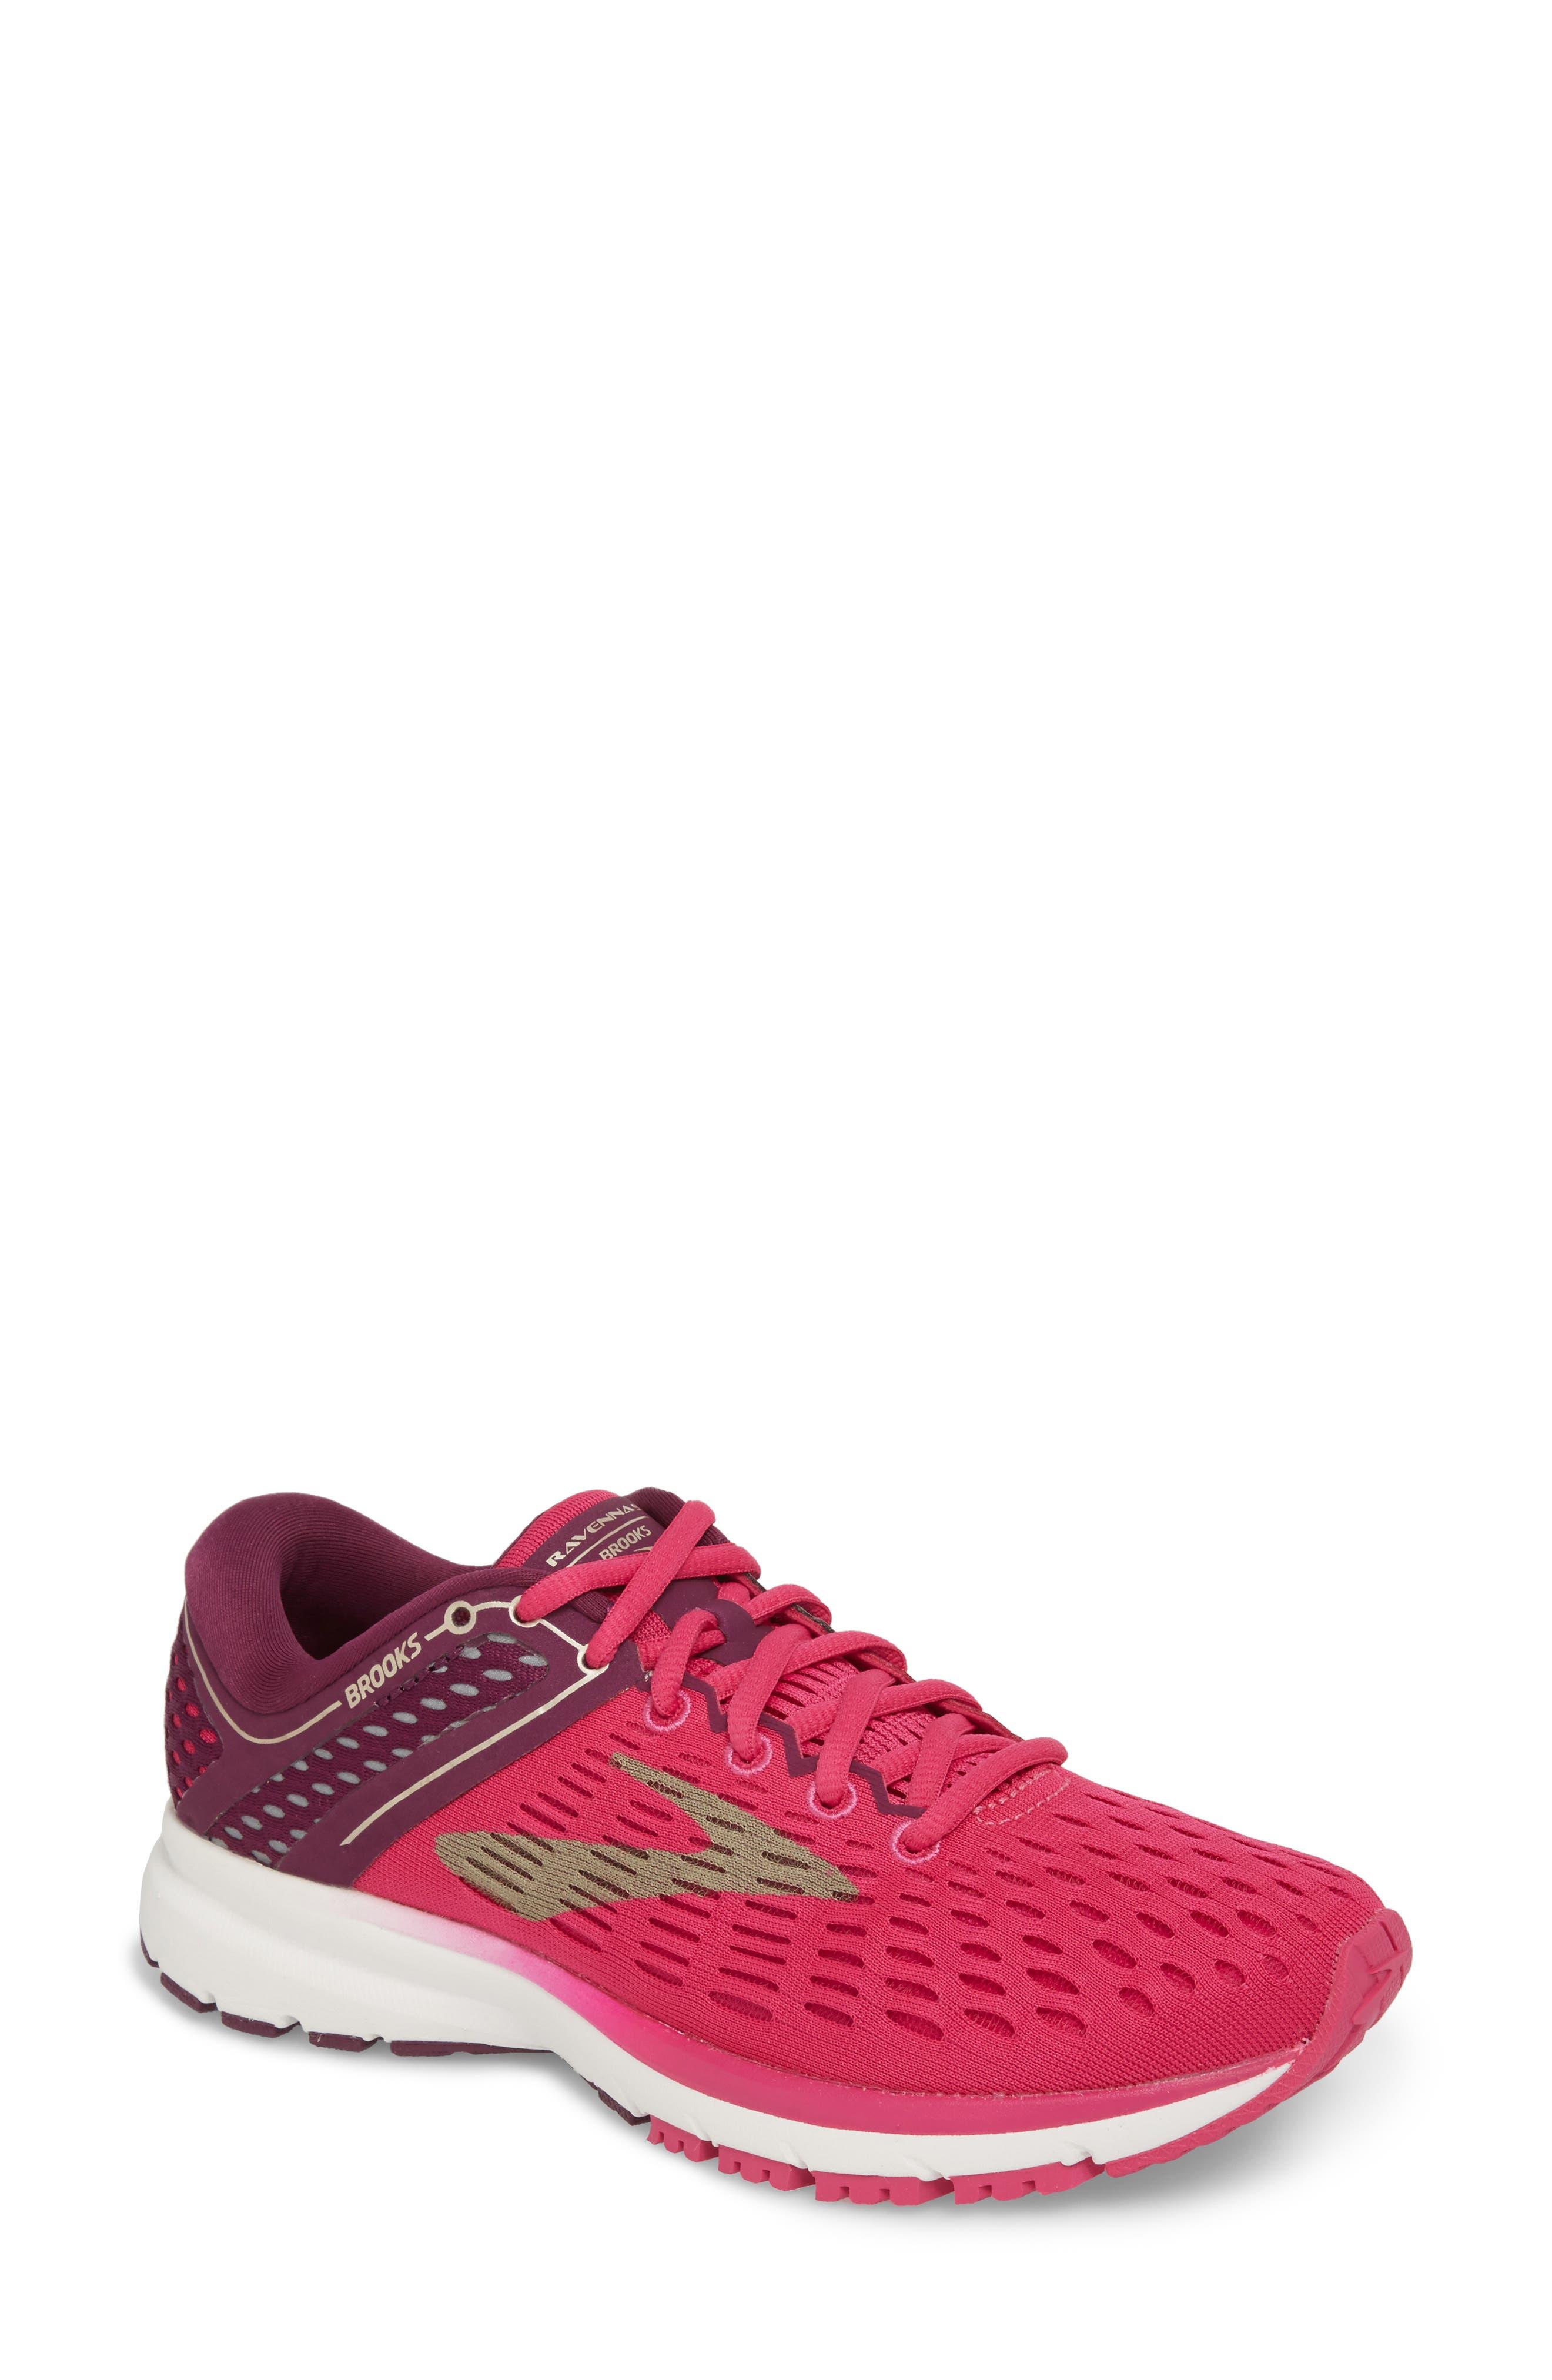 Brooks Ravenna 9 Running Shoe B - Pink